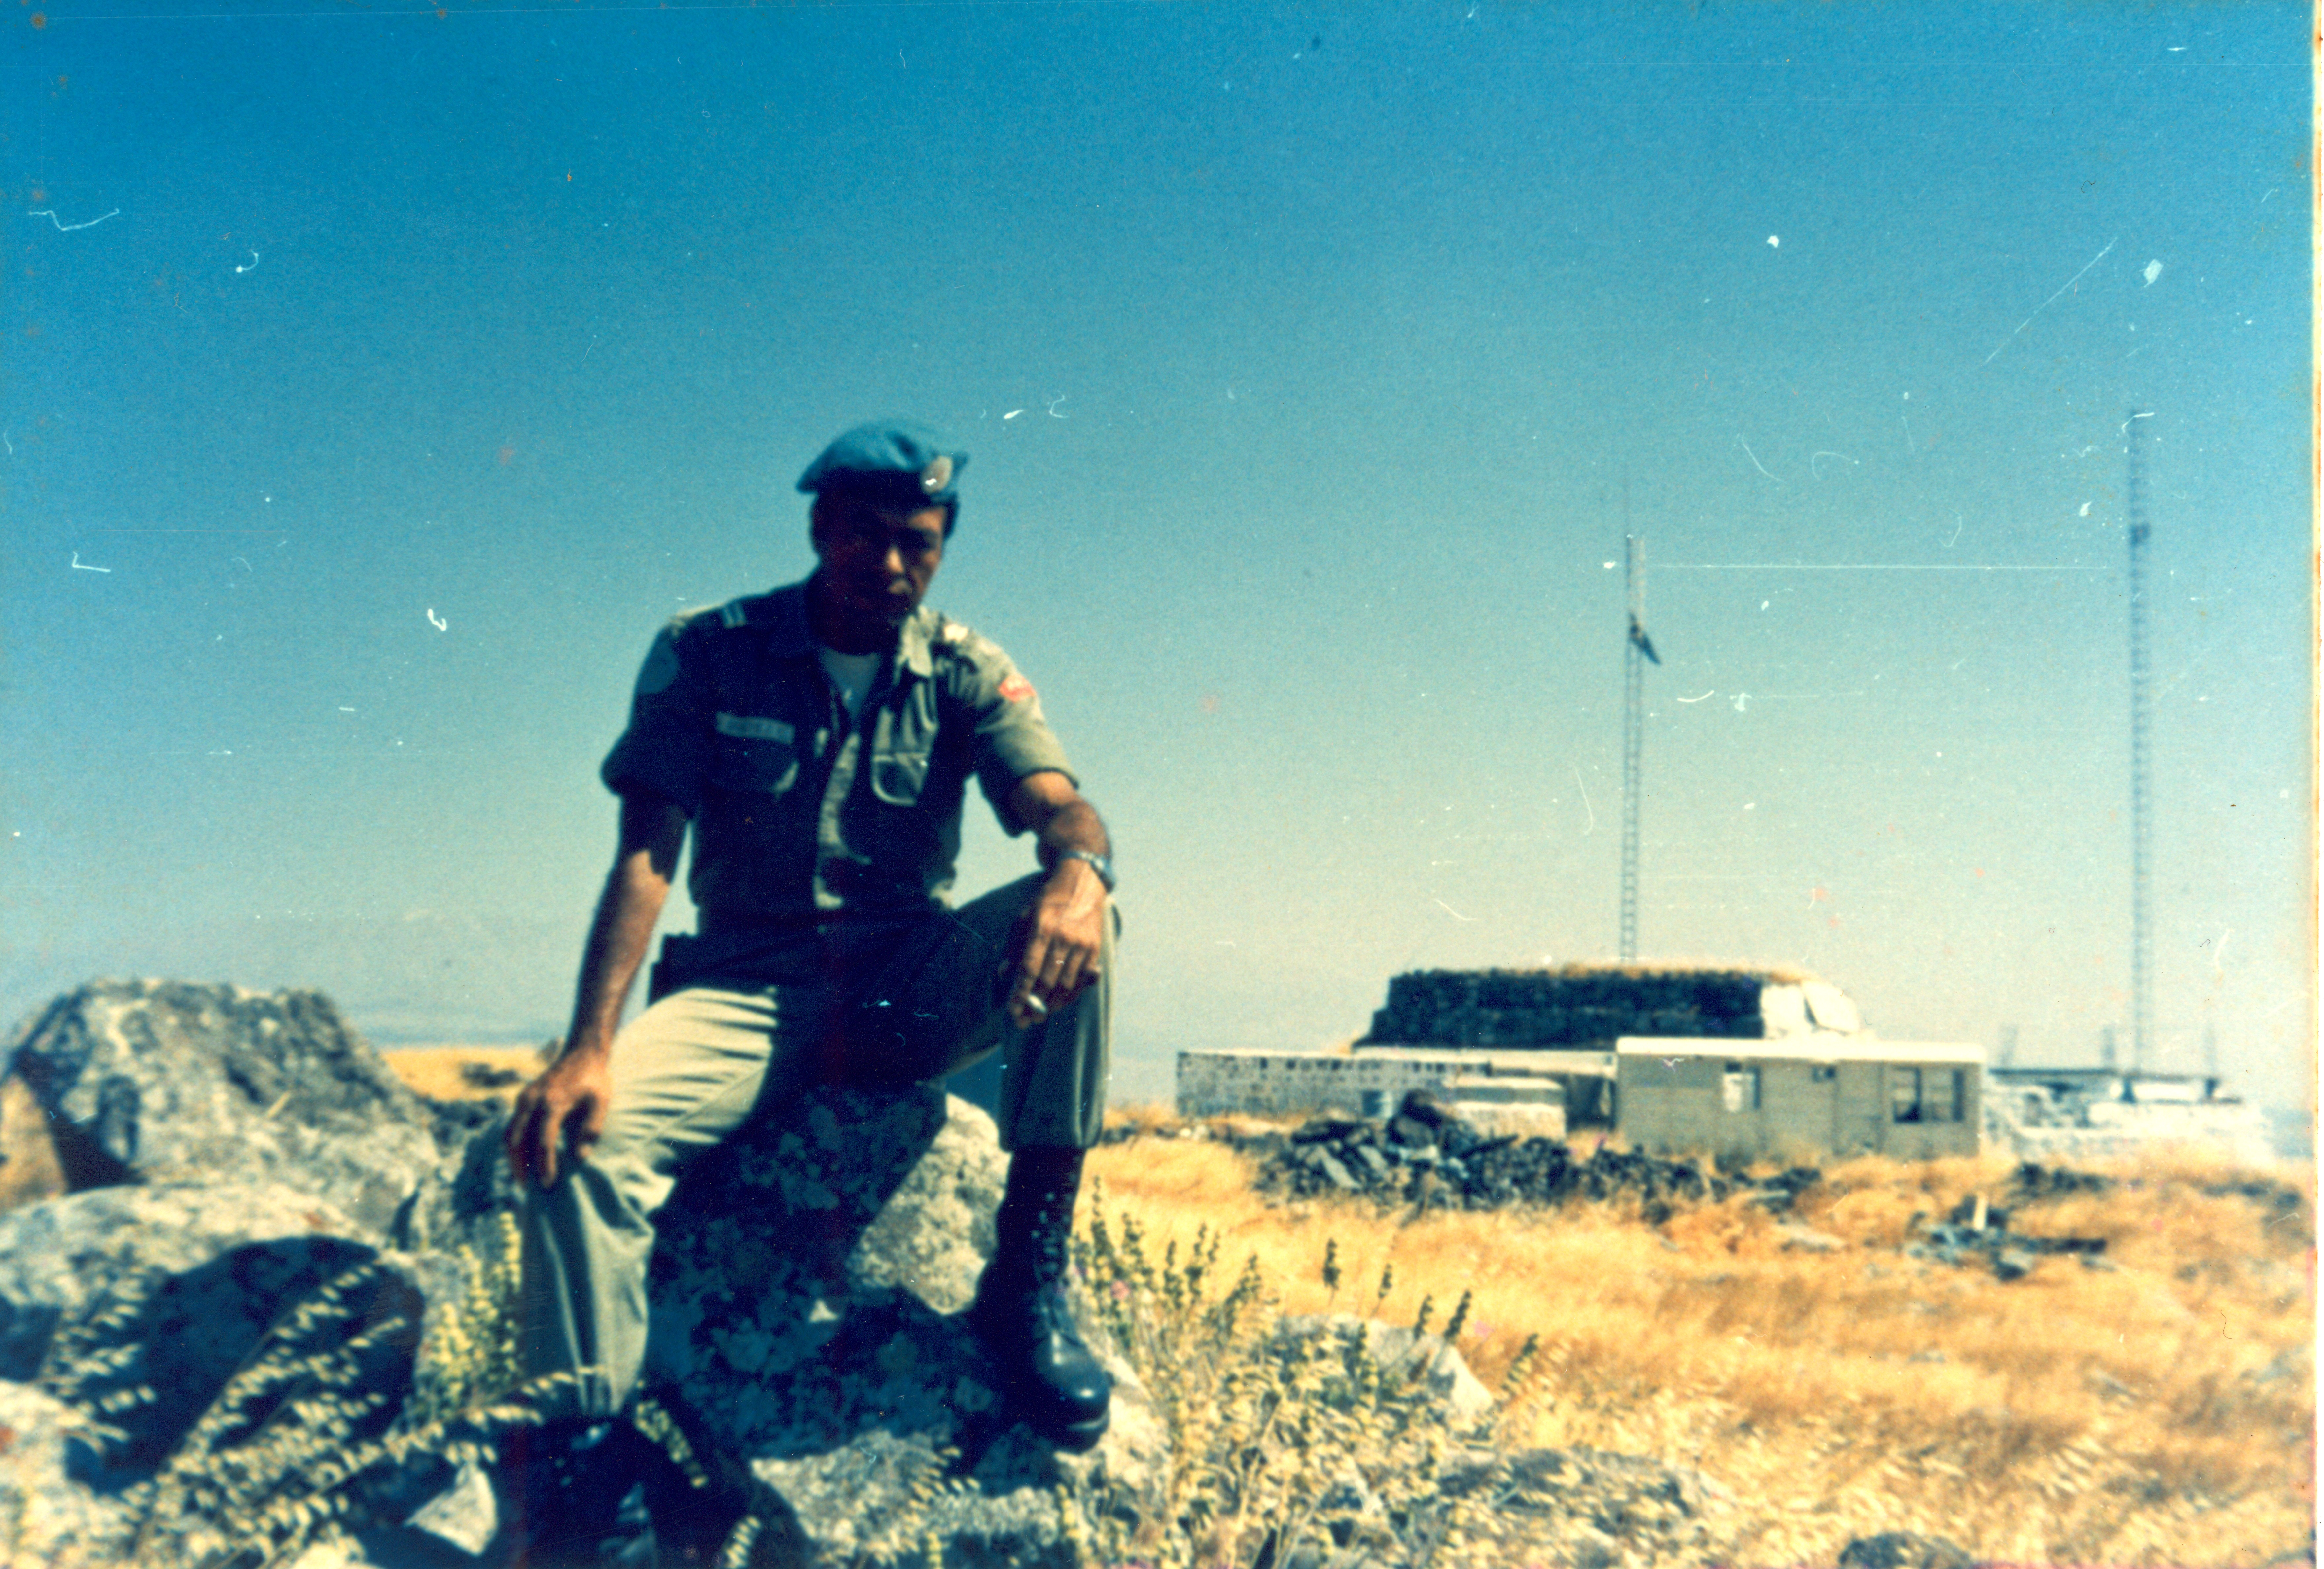 Peruvian Peacekeeper circa 1974 - Copyright Wilder Sanchez